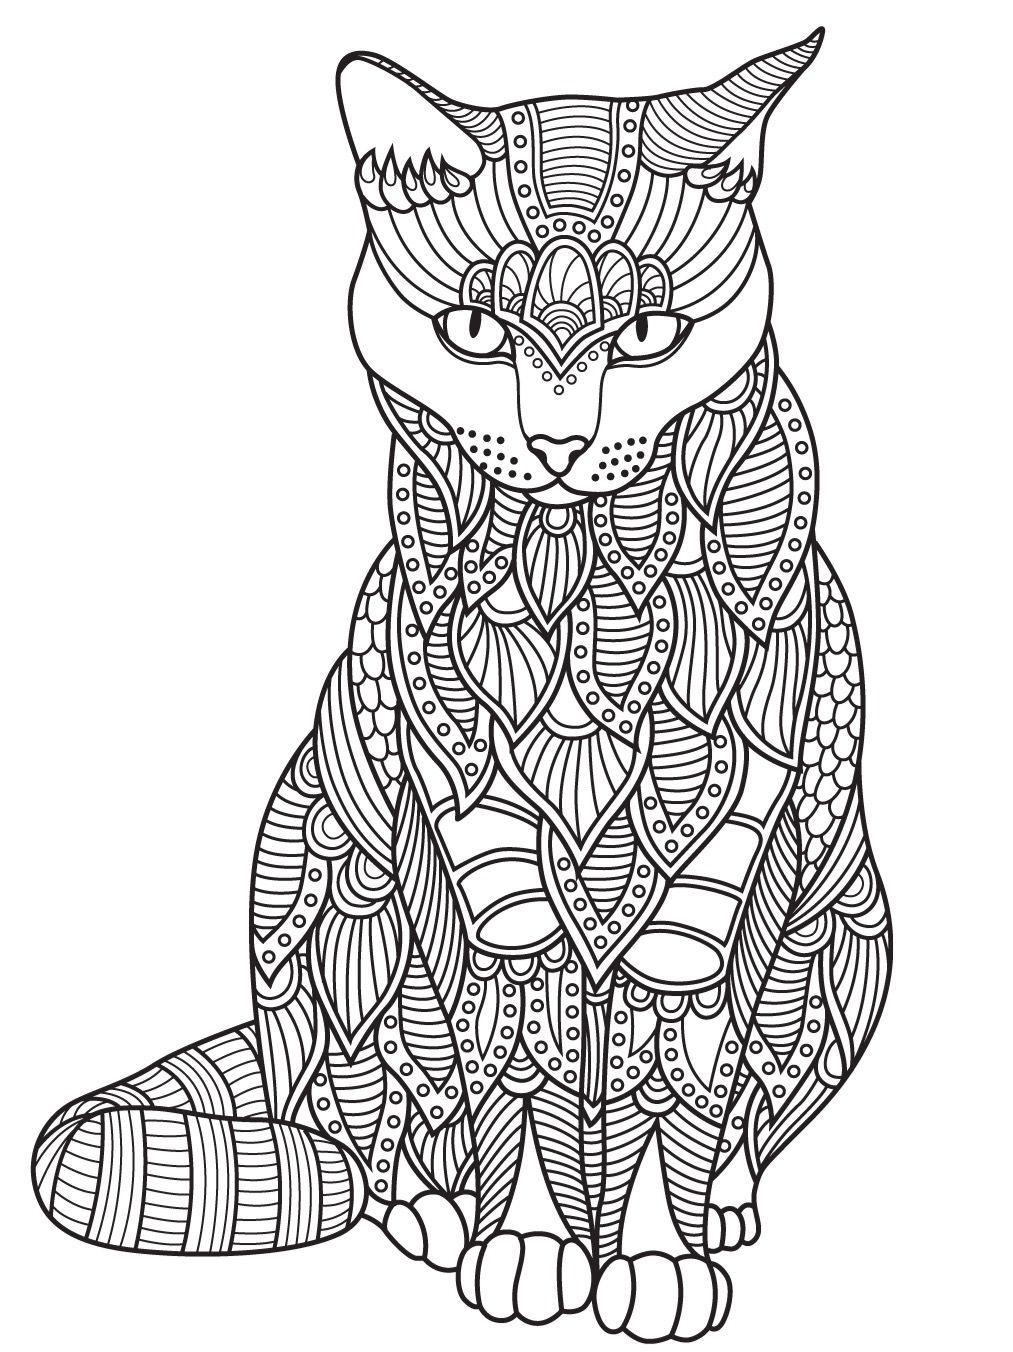 Pin By Daniela Laureiro On Mandalas Para Colorear Cat Coloring Page Kitty Coloring Animal Coloring Pages